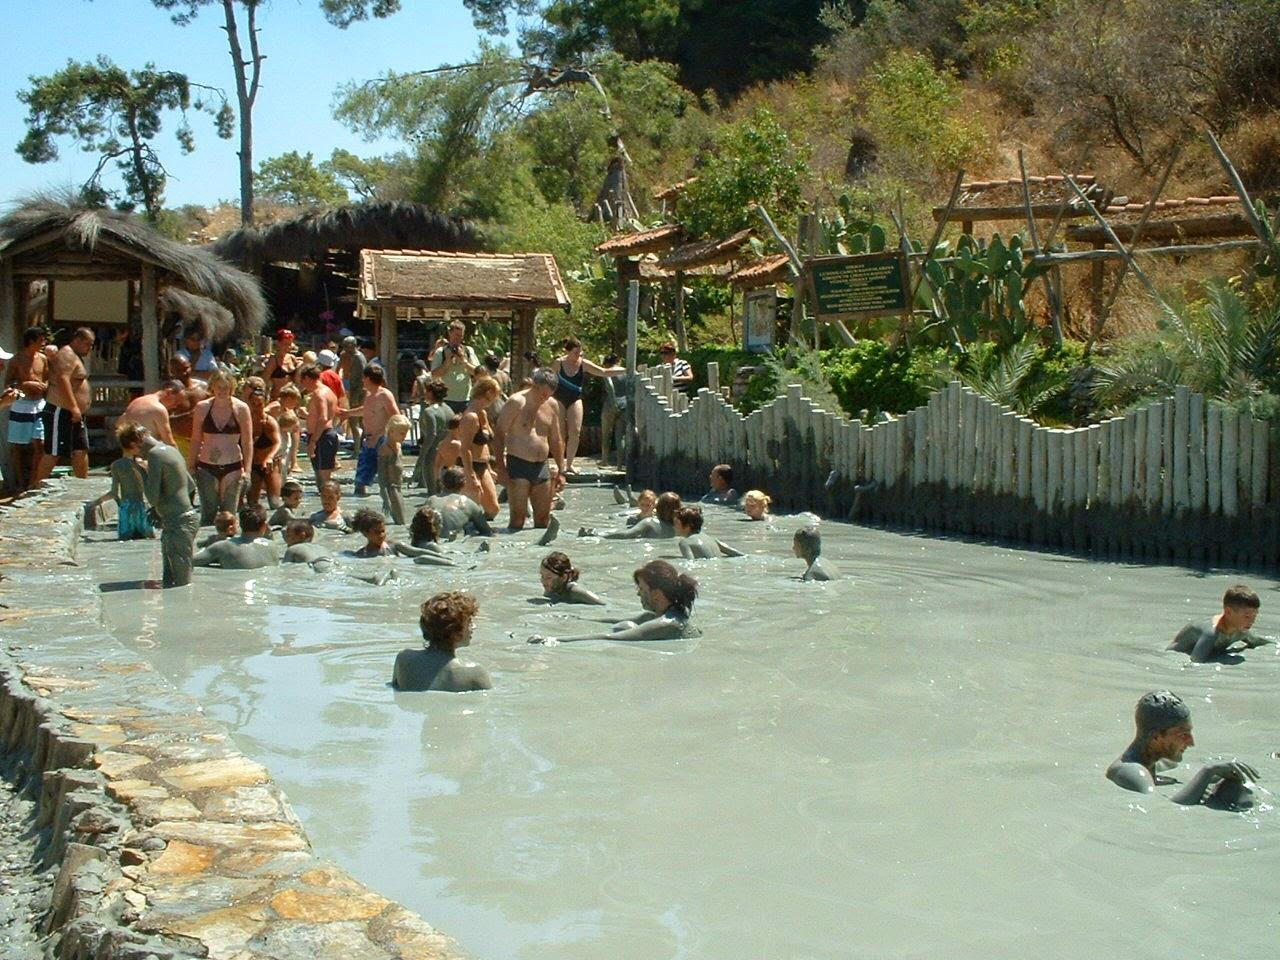 Muğla dalyan çamur banyosu